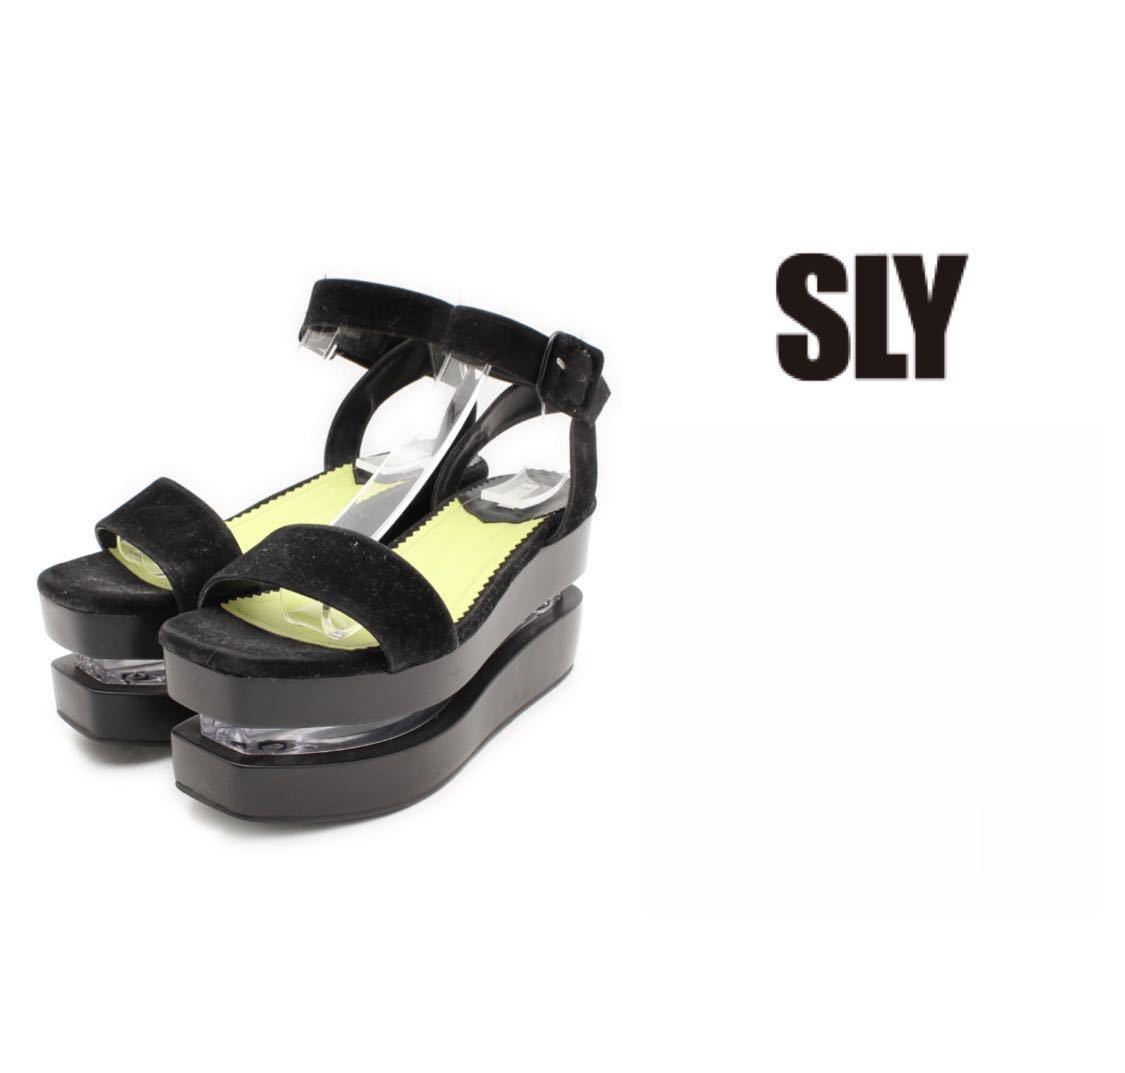 SLY プラットフォームサンダル厚底ストラップシューズレディースLサイズ美品クロブラックスライ女性用_画像1